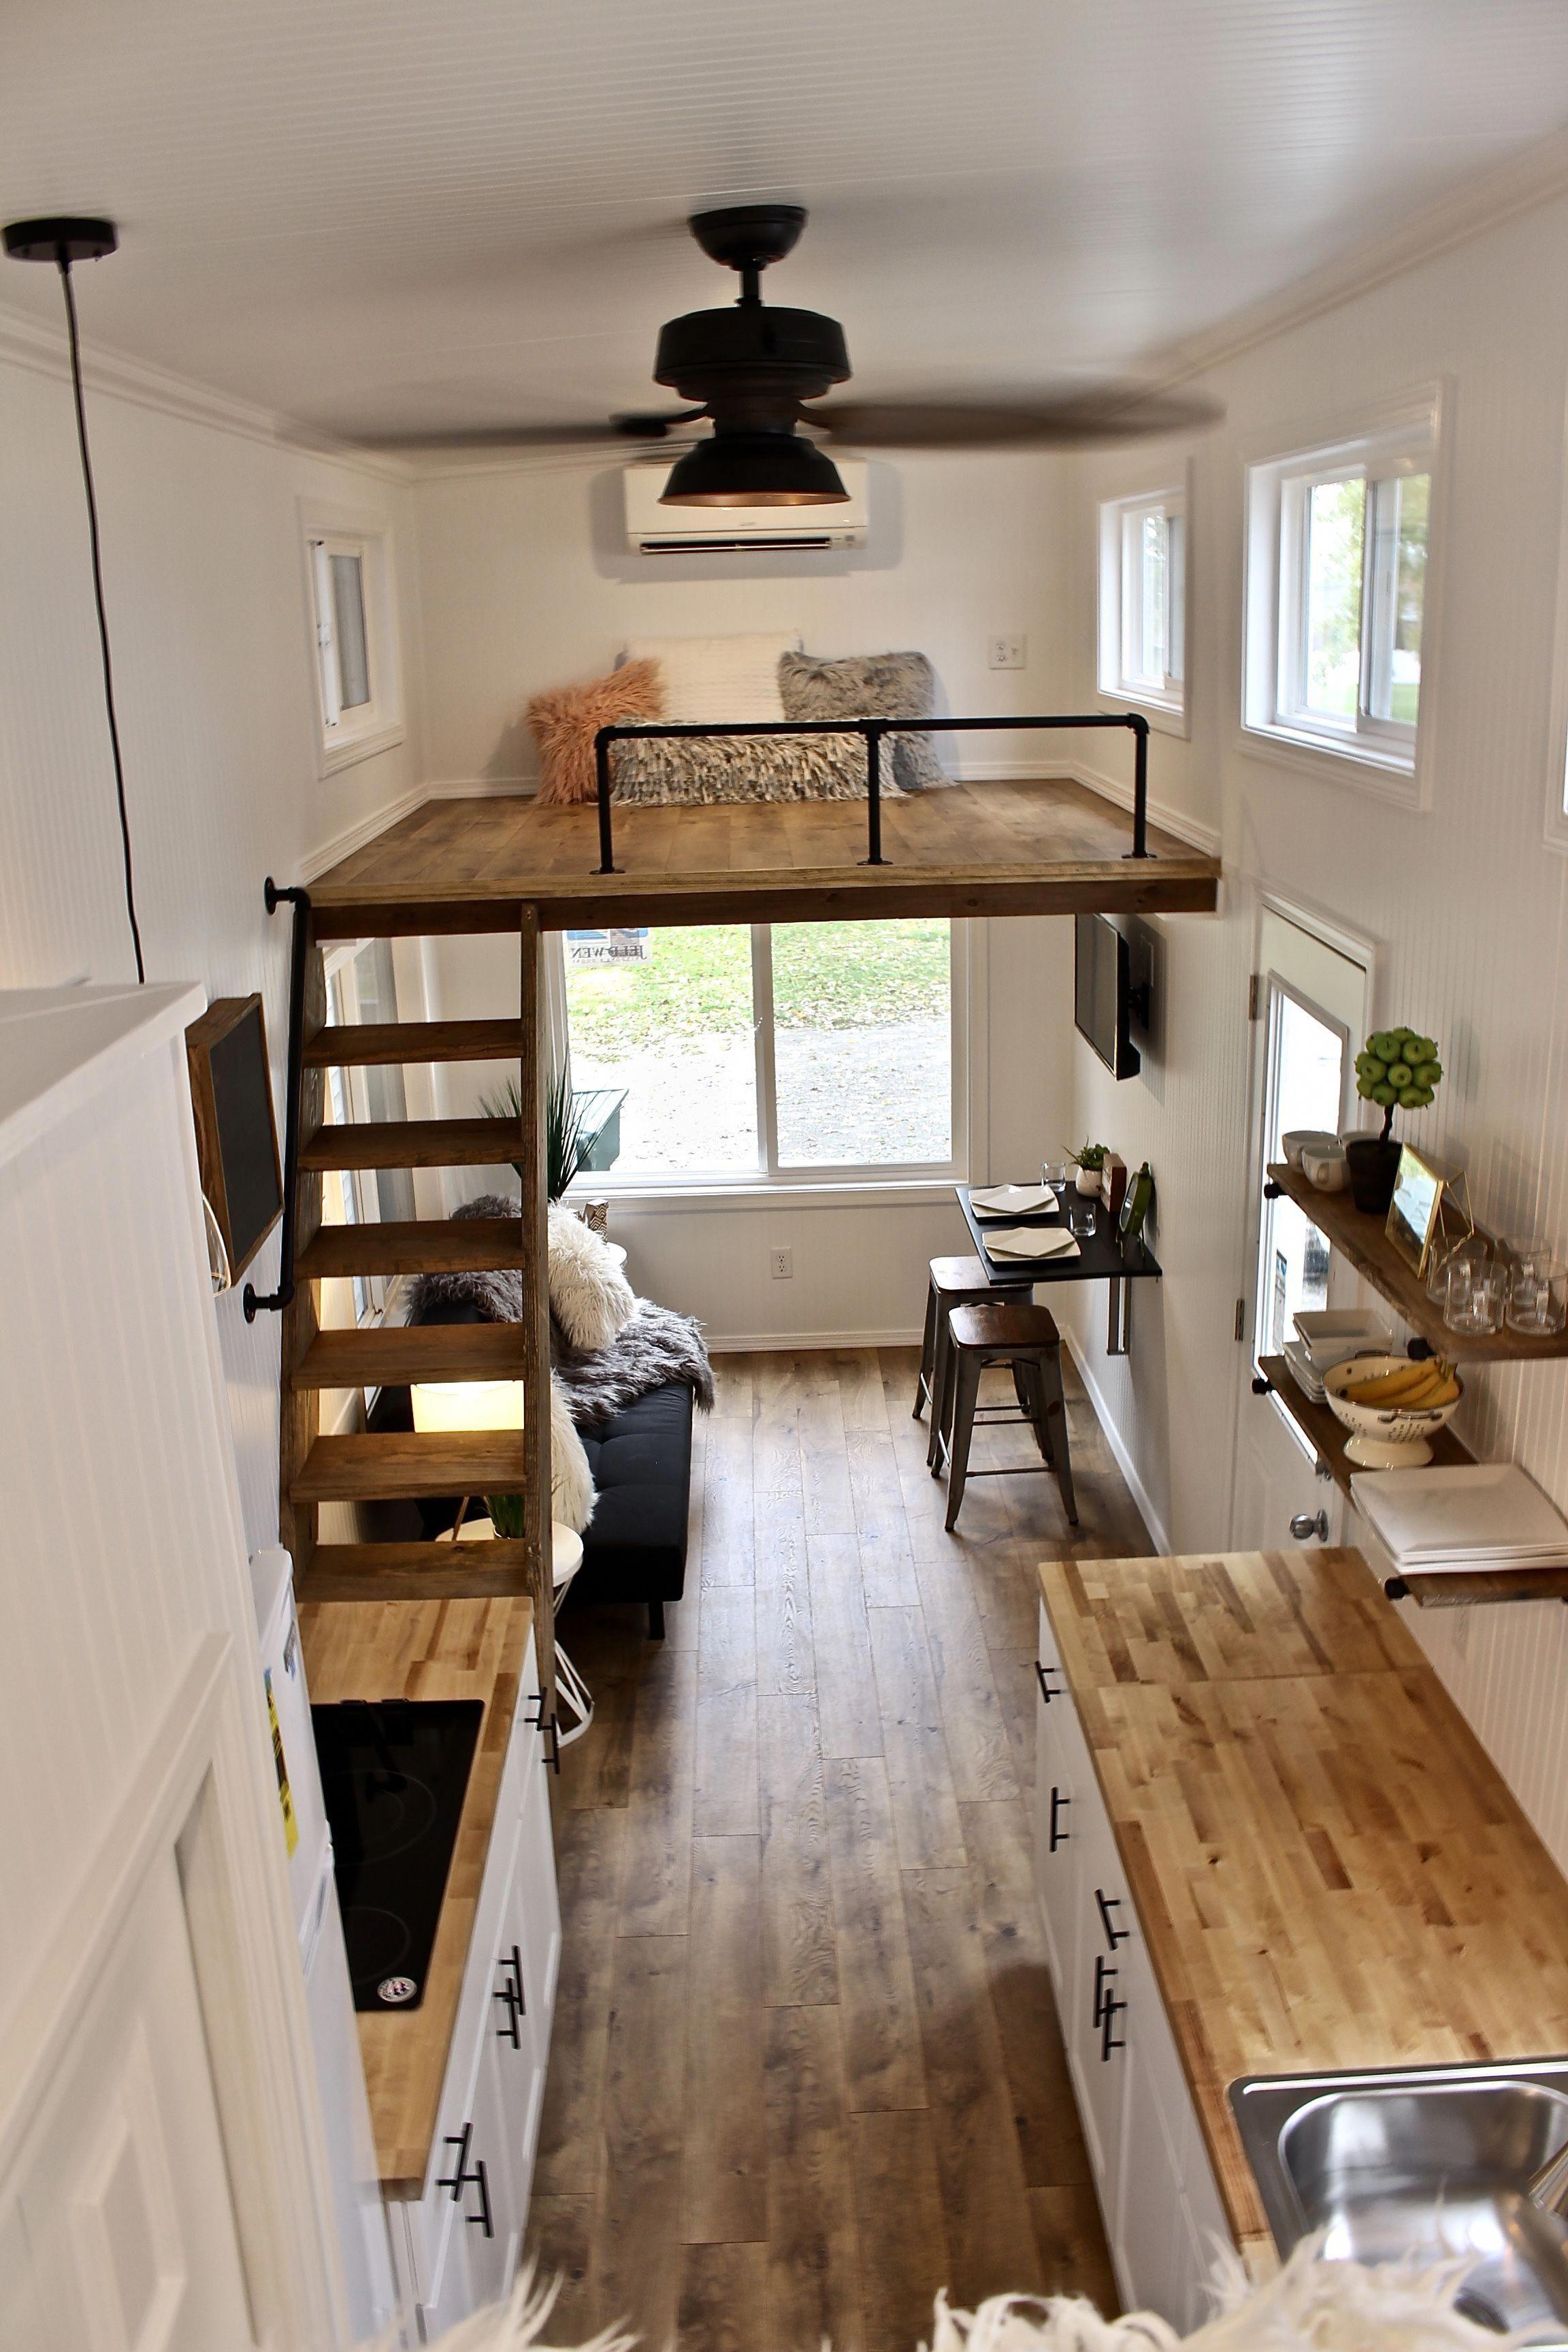 26' Chateau Shack Tiny Home on Wheels #tinyhomes